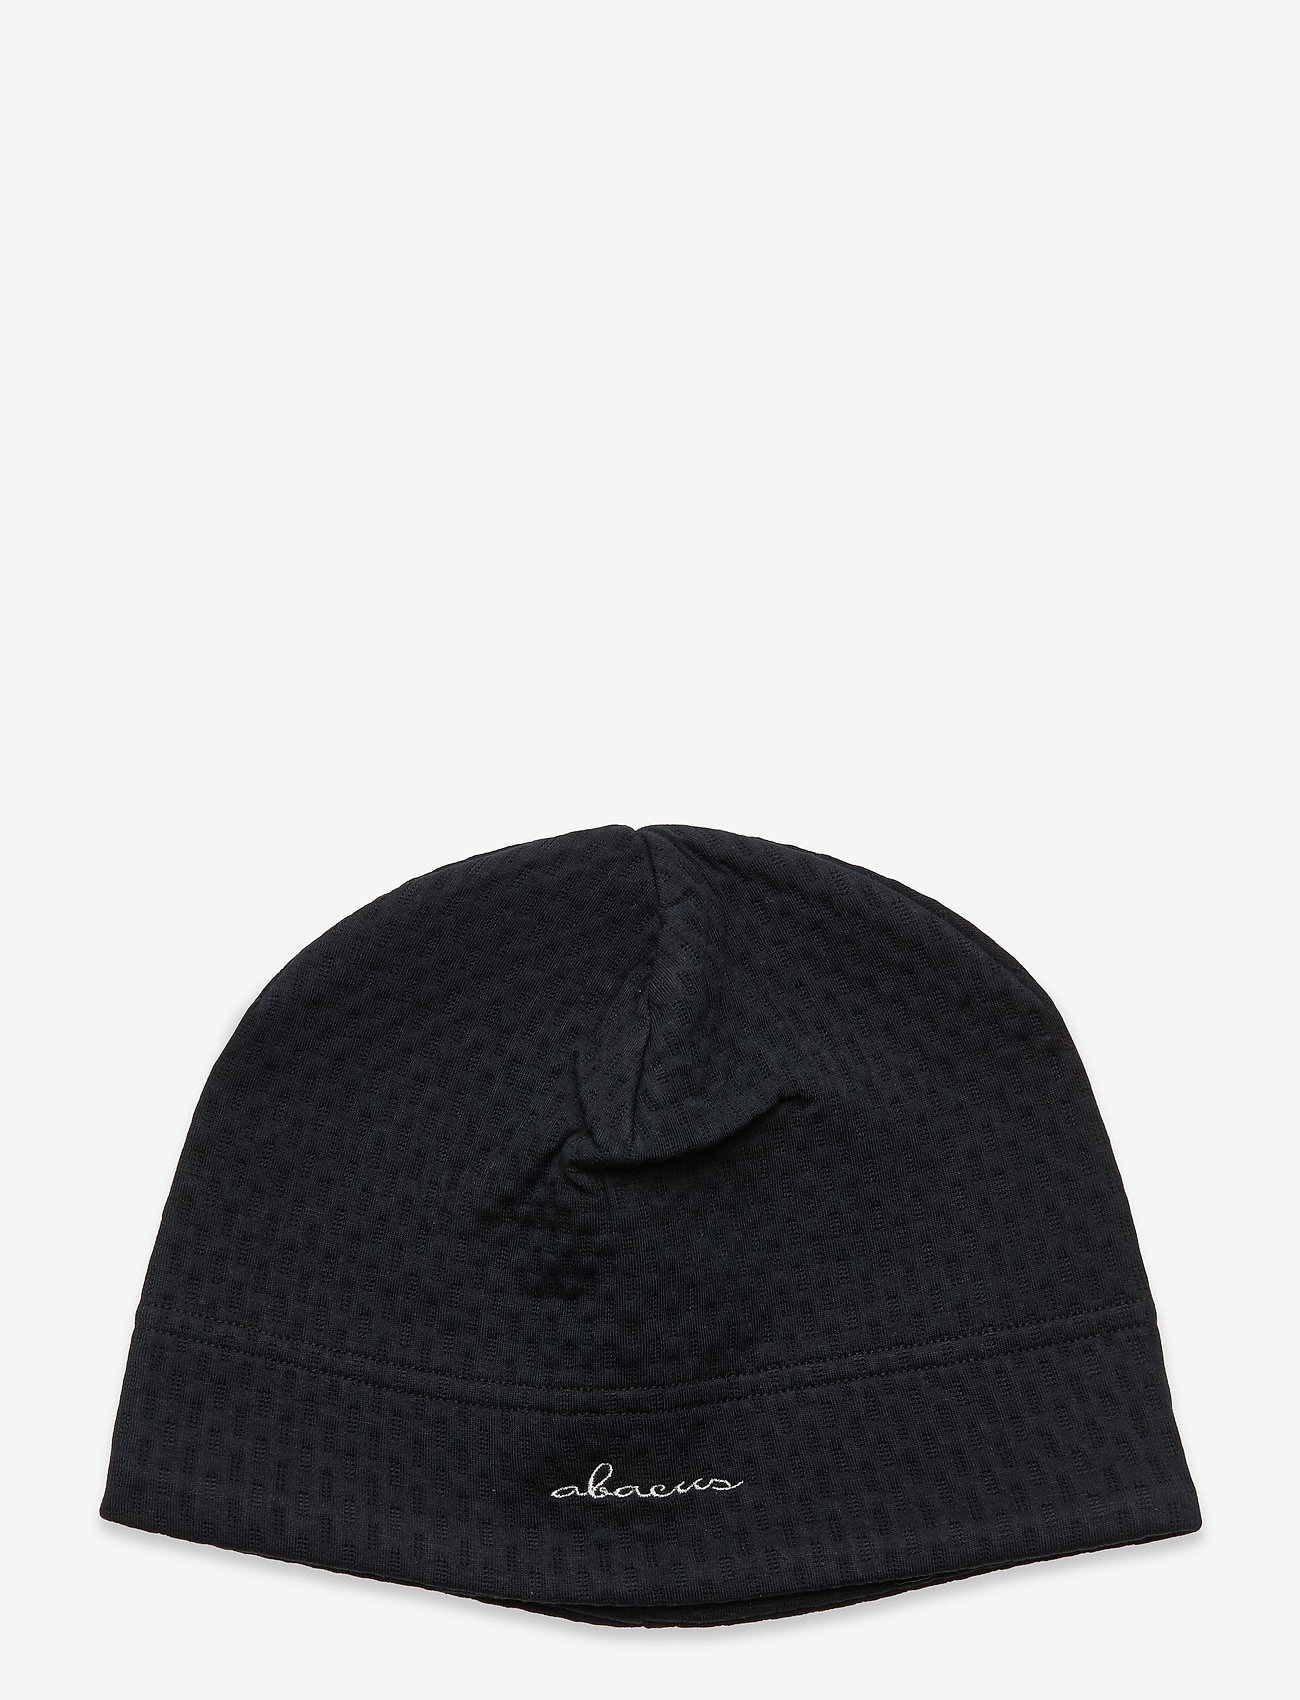 Abacus - Sunningdale hat - mutsen - navy - 0